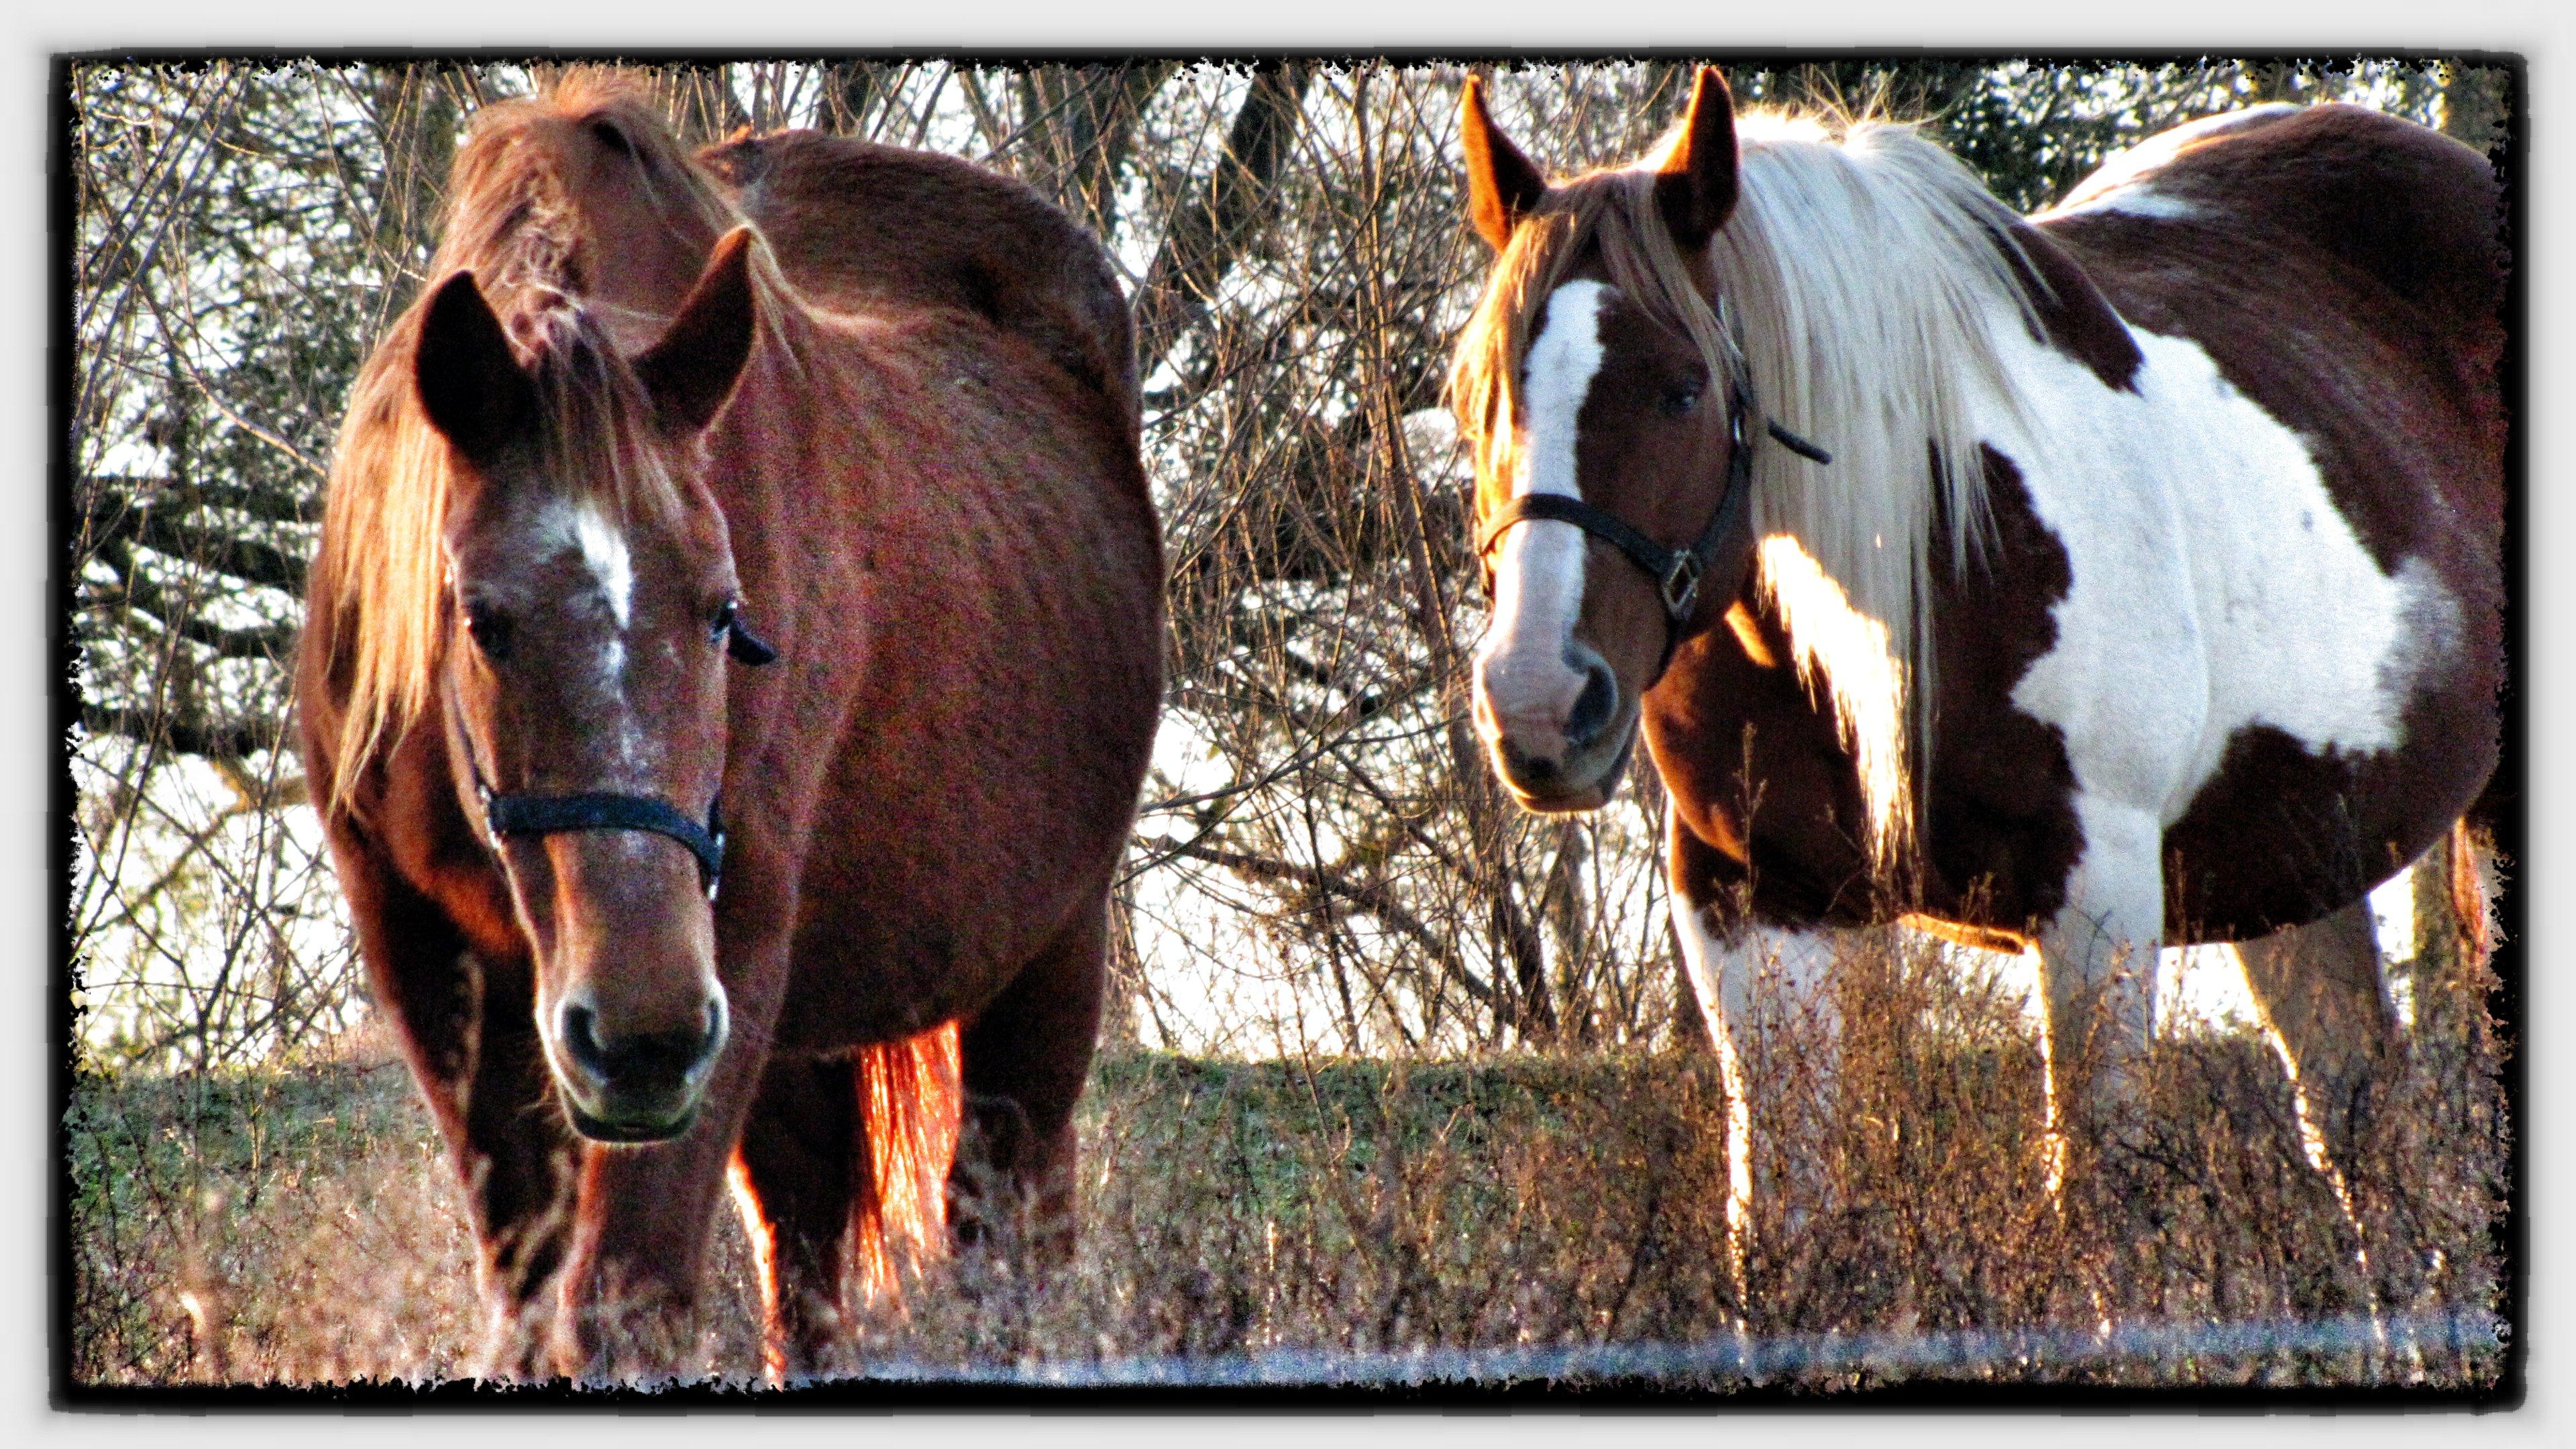 Fotos gratis : manada, pastar, pasto, marrón, semental, melena, dos ...